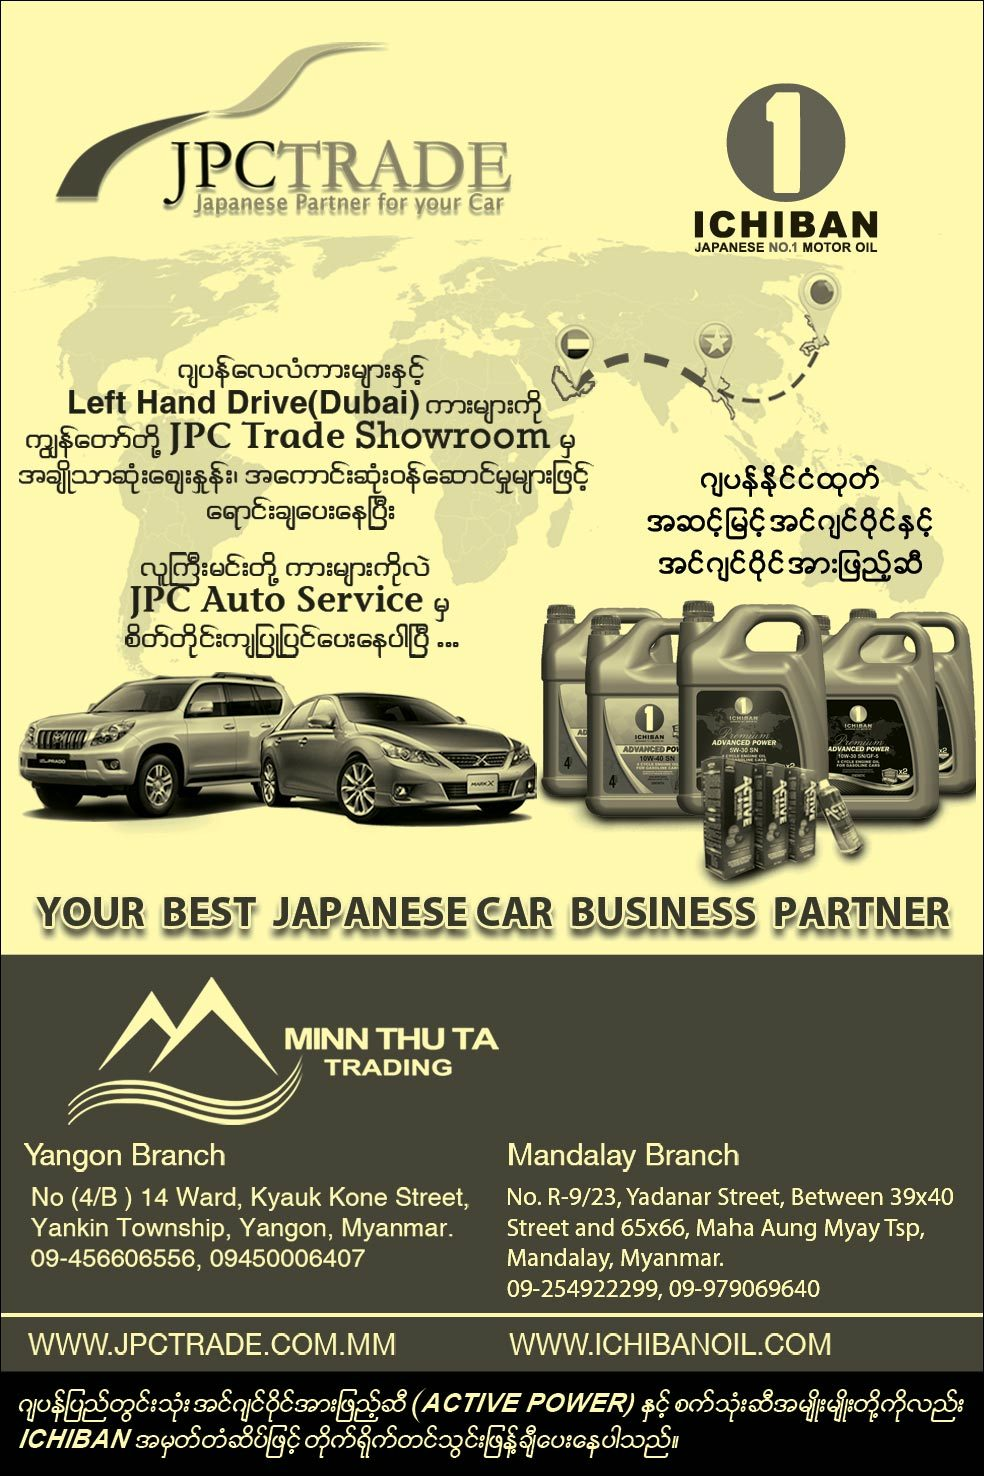 Min-Thu-Ta-Trading_Car-Truck-Dealers-&-Importer_(A)_956.jpg